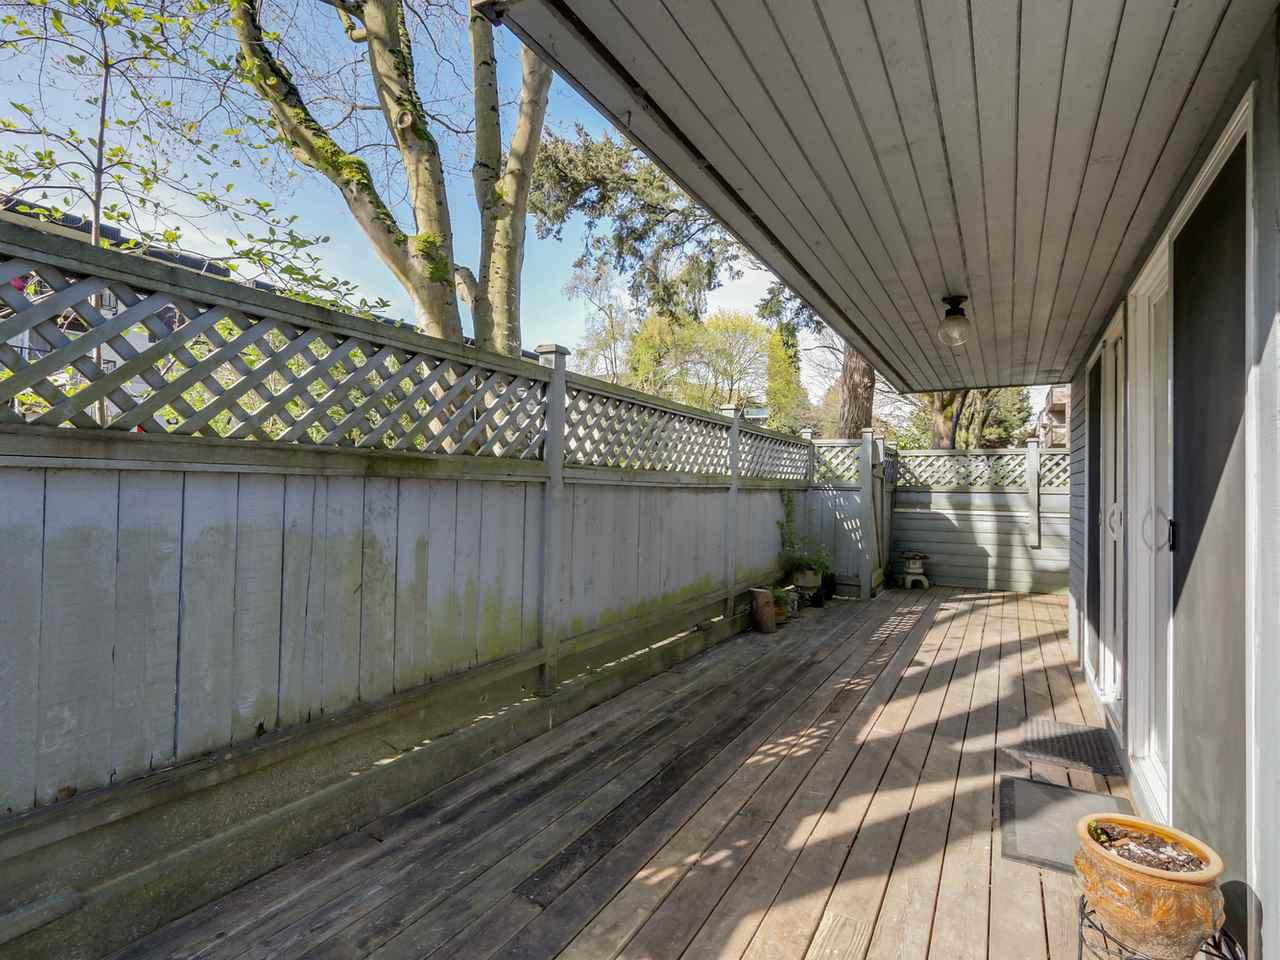 "Photo 3: Photos: 115 2125 YORK Avenue in Vancouver: Kitsilano Condo for sale in ""YORK GARDENS"" (Vancouver West)  : MLS®# R2054686"